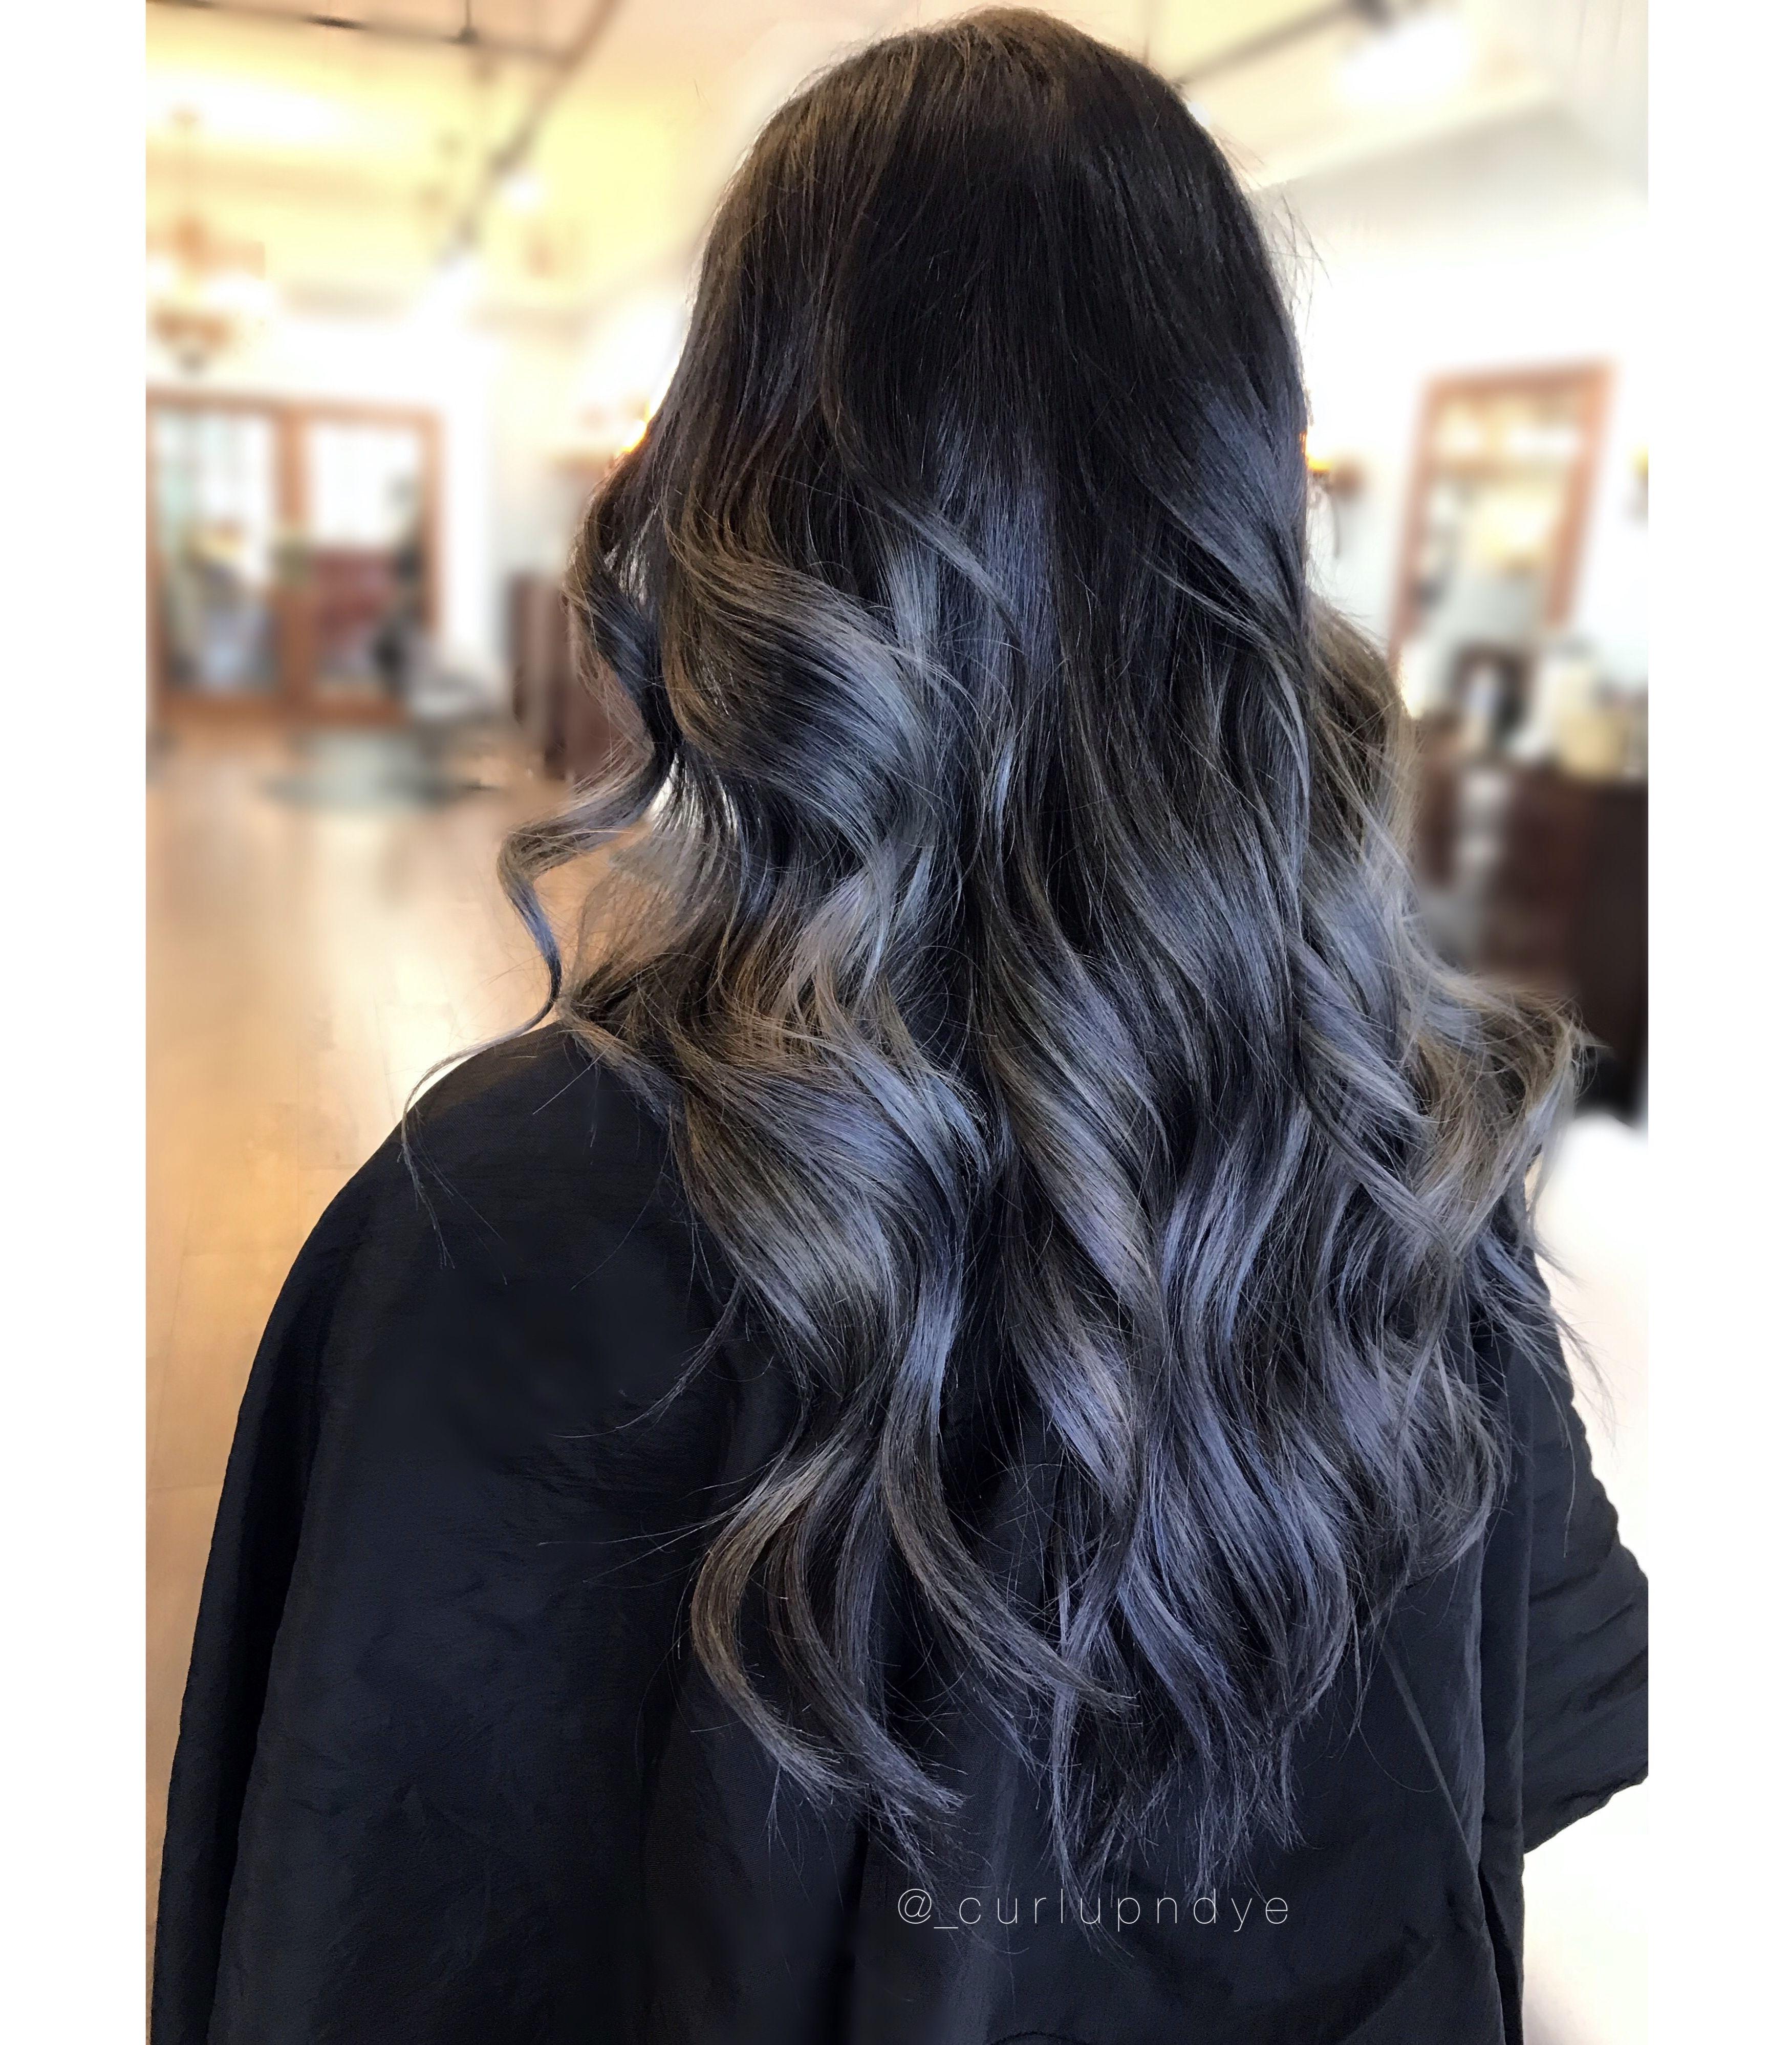 Blackhair Bluehair Balayage Longhair Wavyhair Hair Styles Black Balayage Long Hair Styles